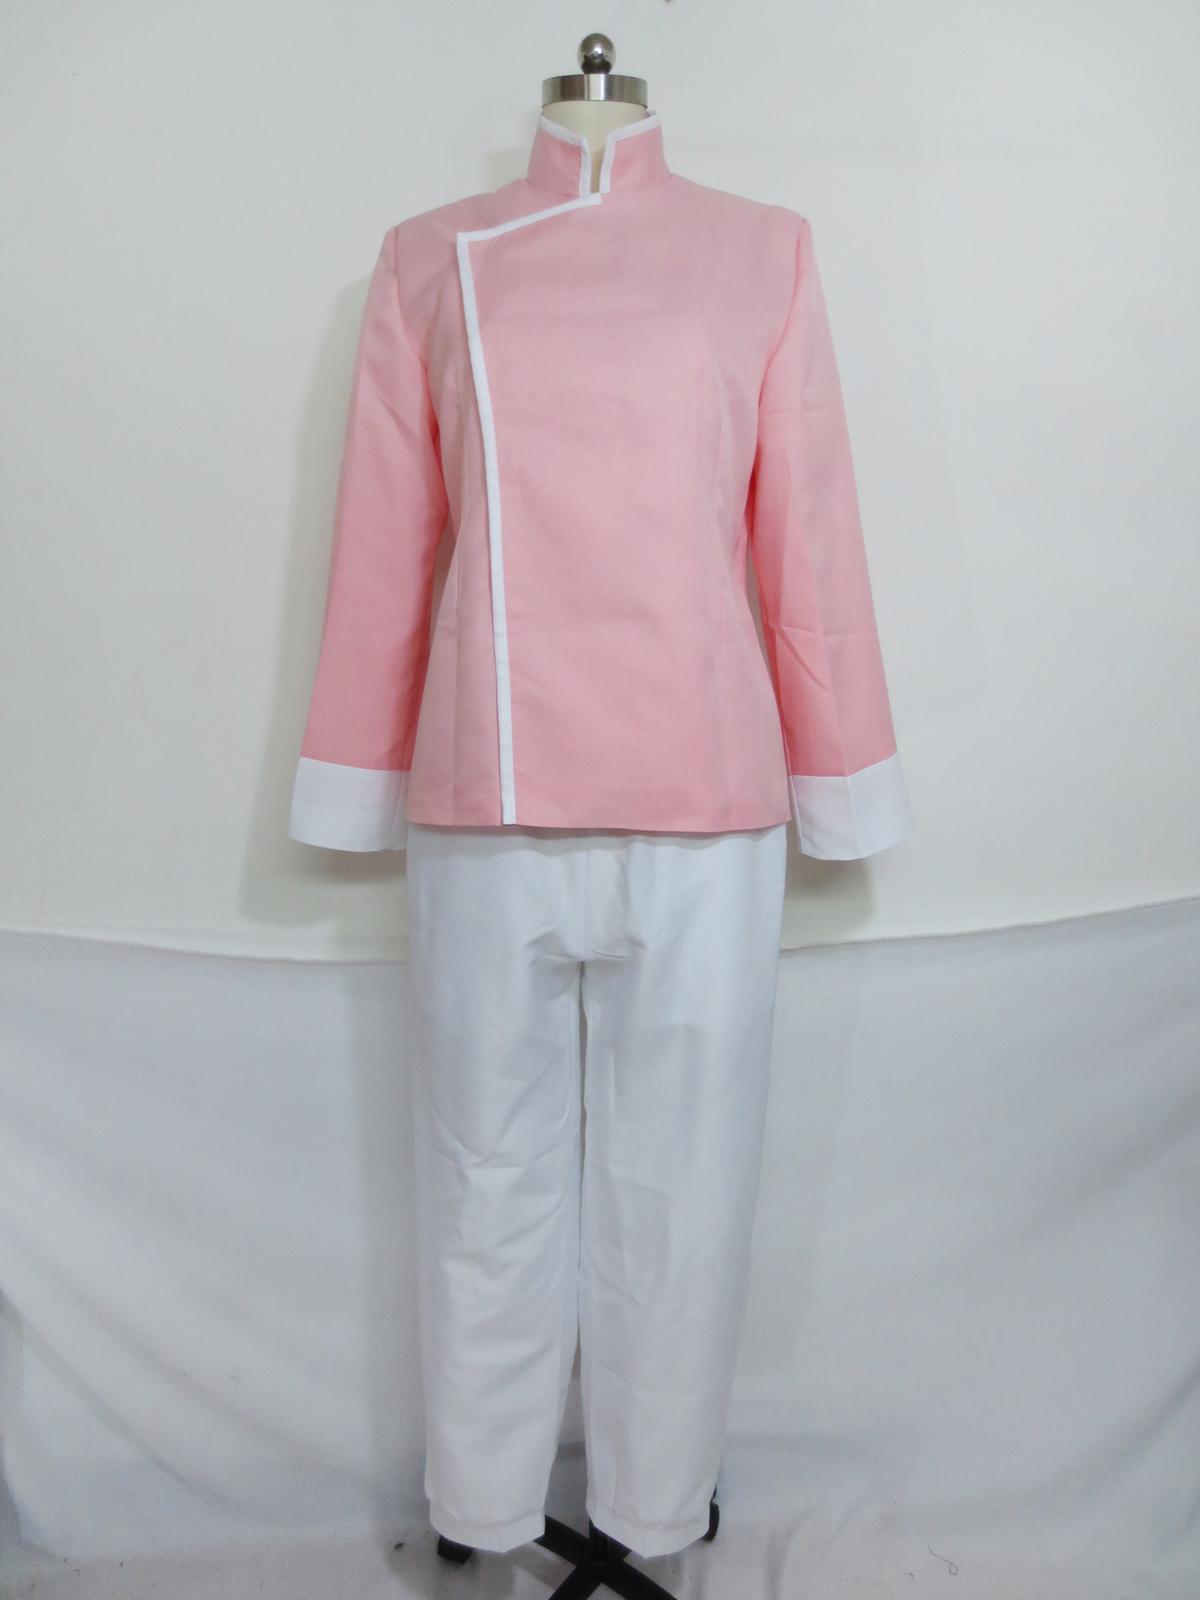 Fullmetal Alchemist Cosplay Mai Chang Rosa Kung Fu Uniform Kostüm